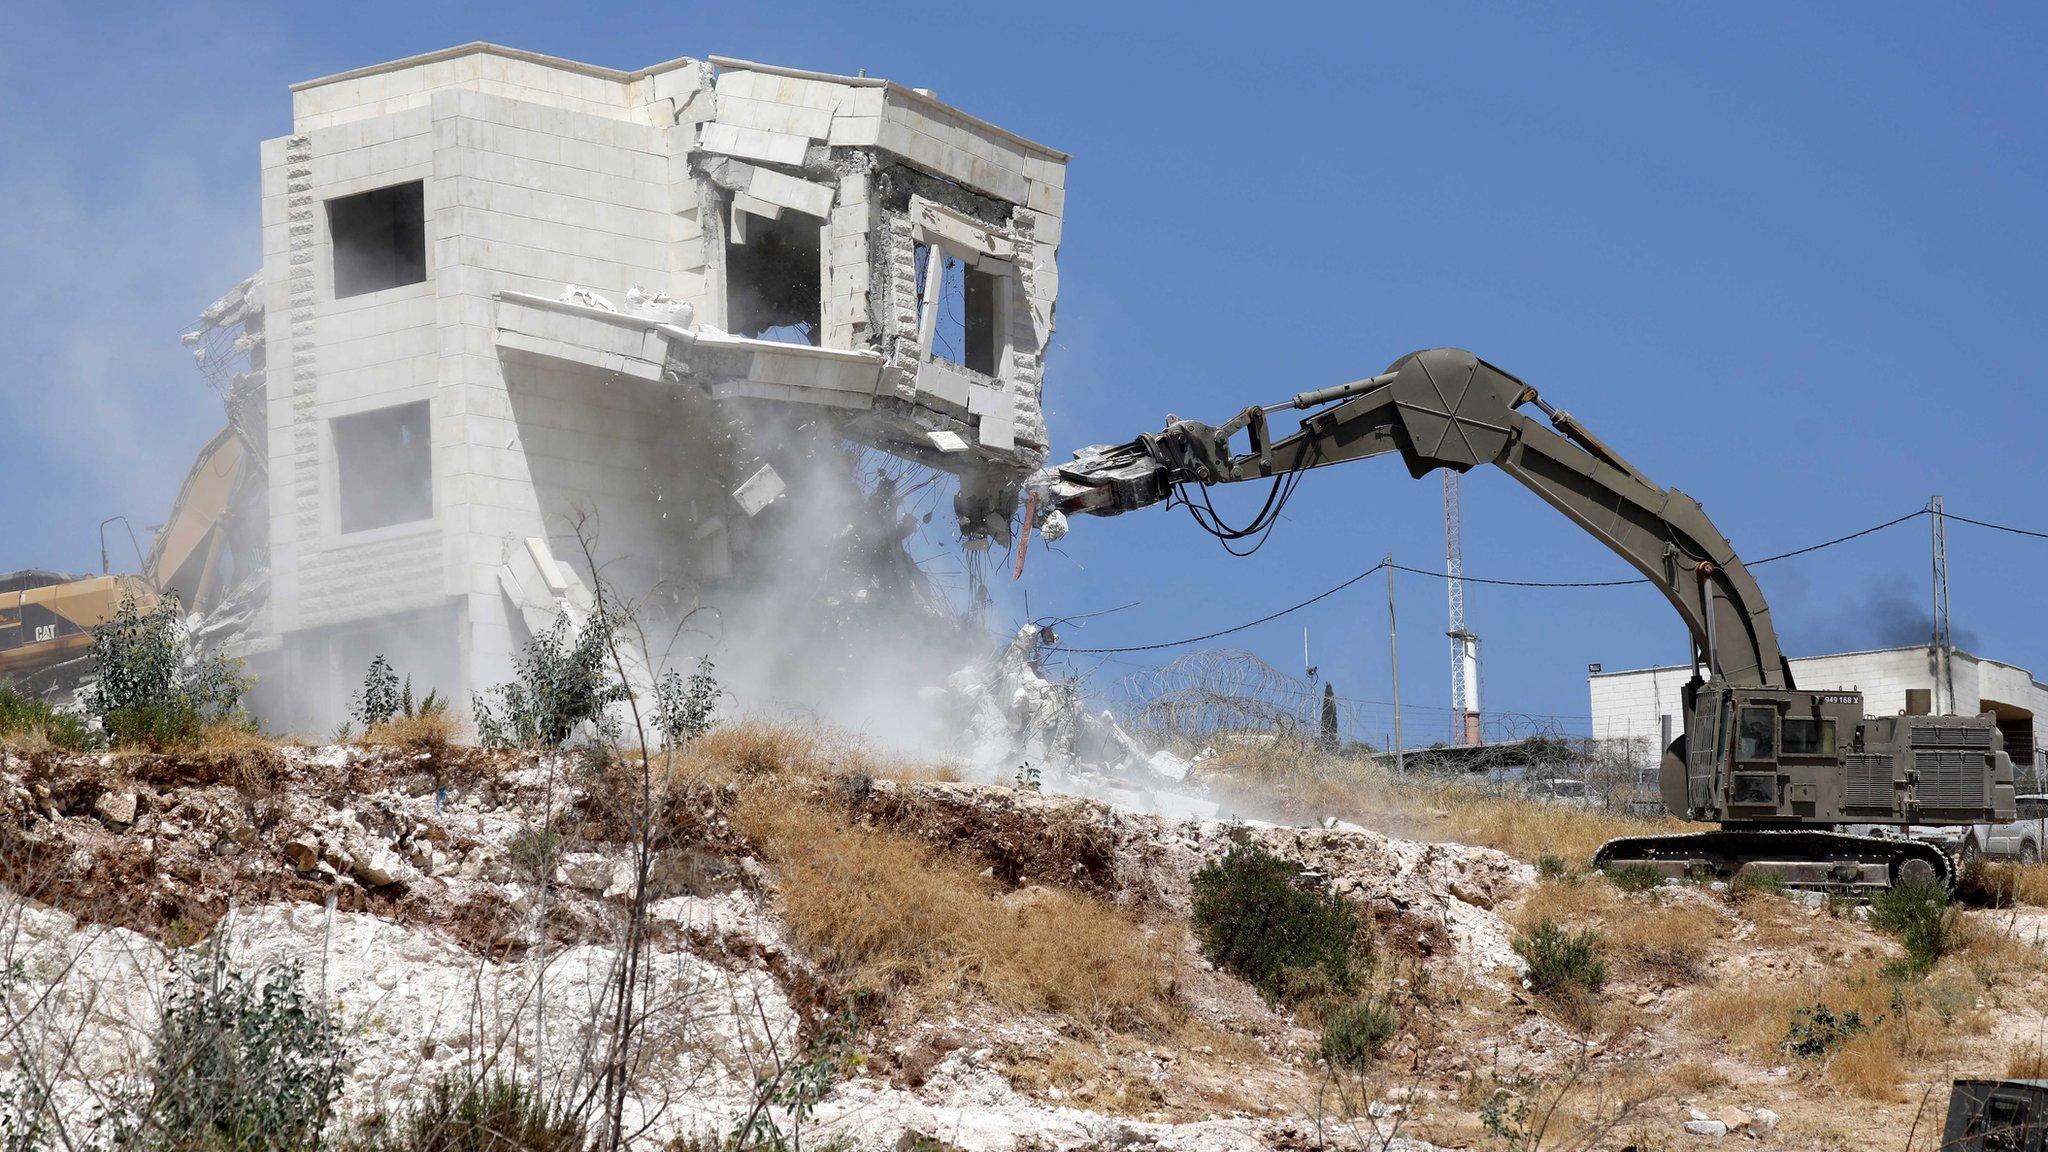 MA Israel mengatakan rumah-rumah itu merupakan ancaman keamanan.